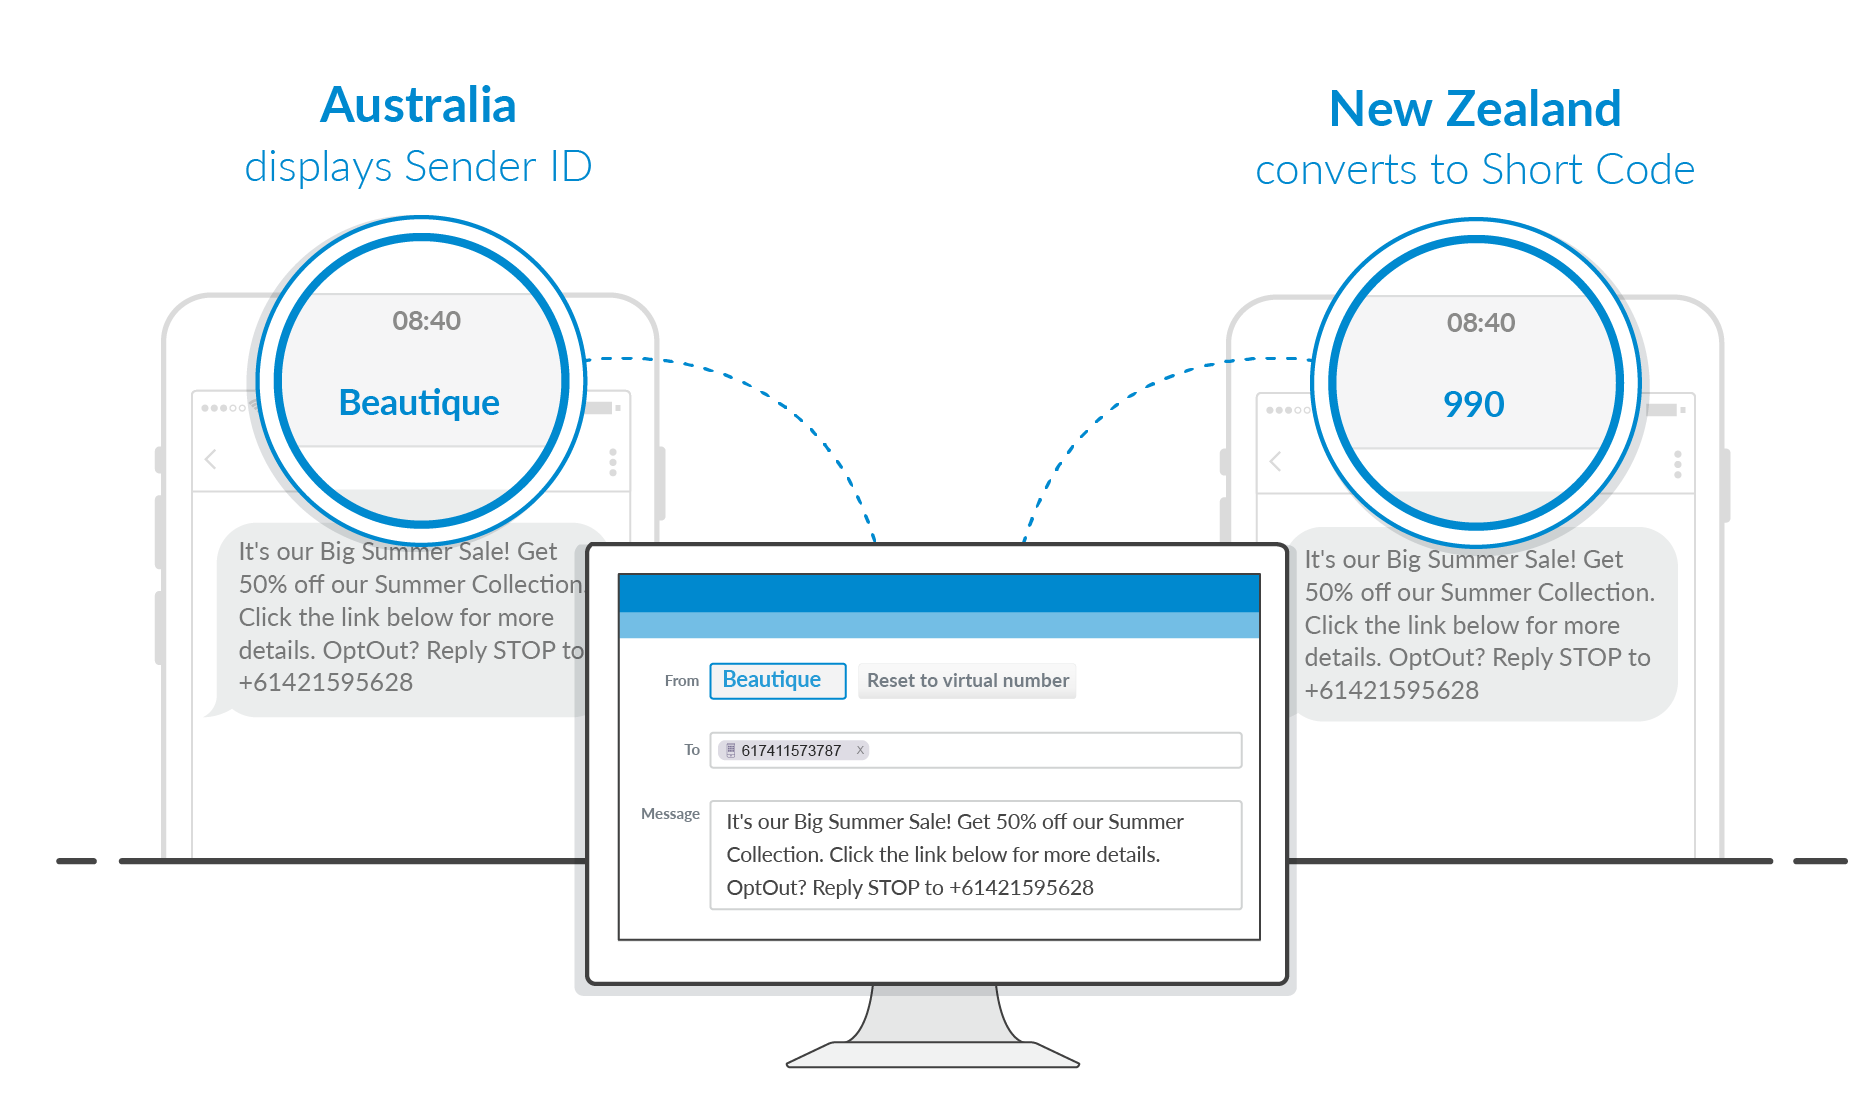 Displaying Sender ID in AU & NZ